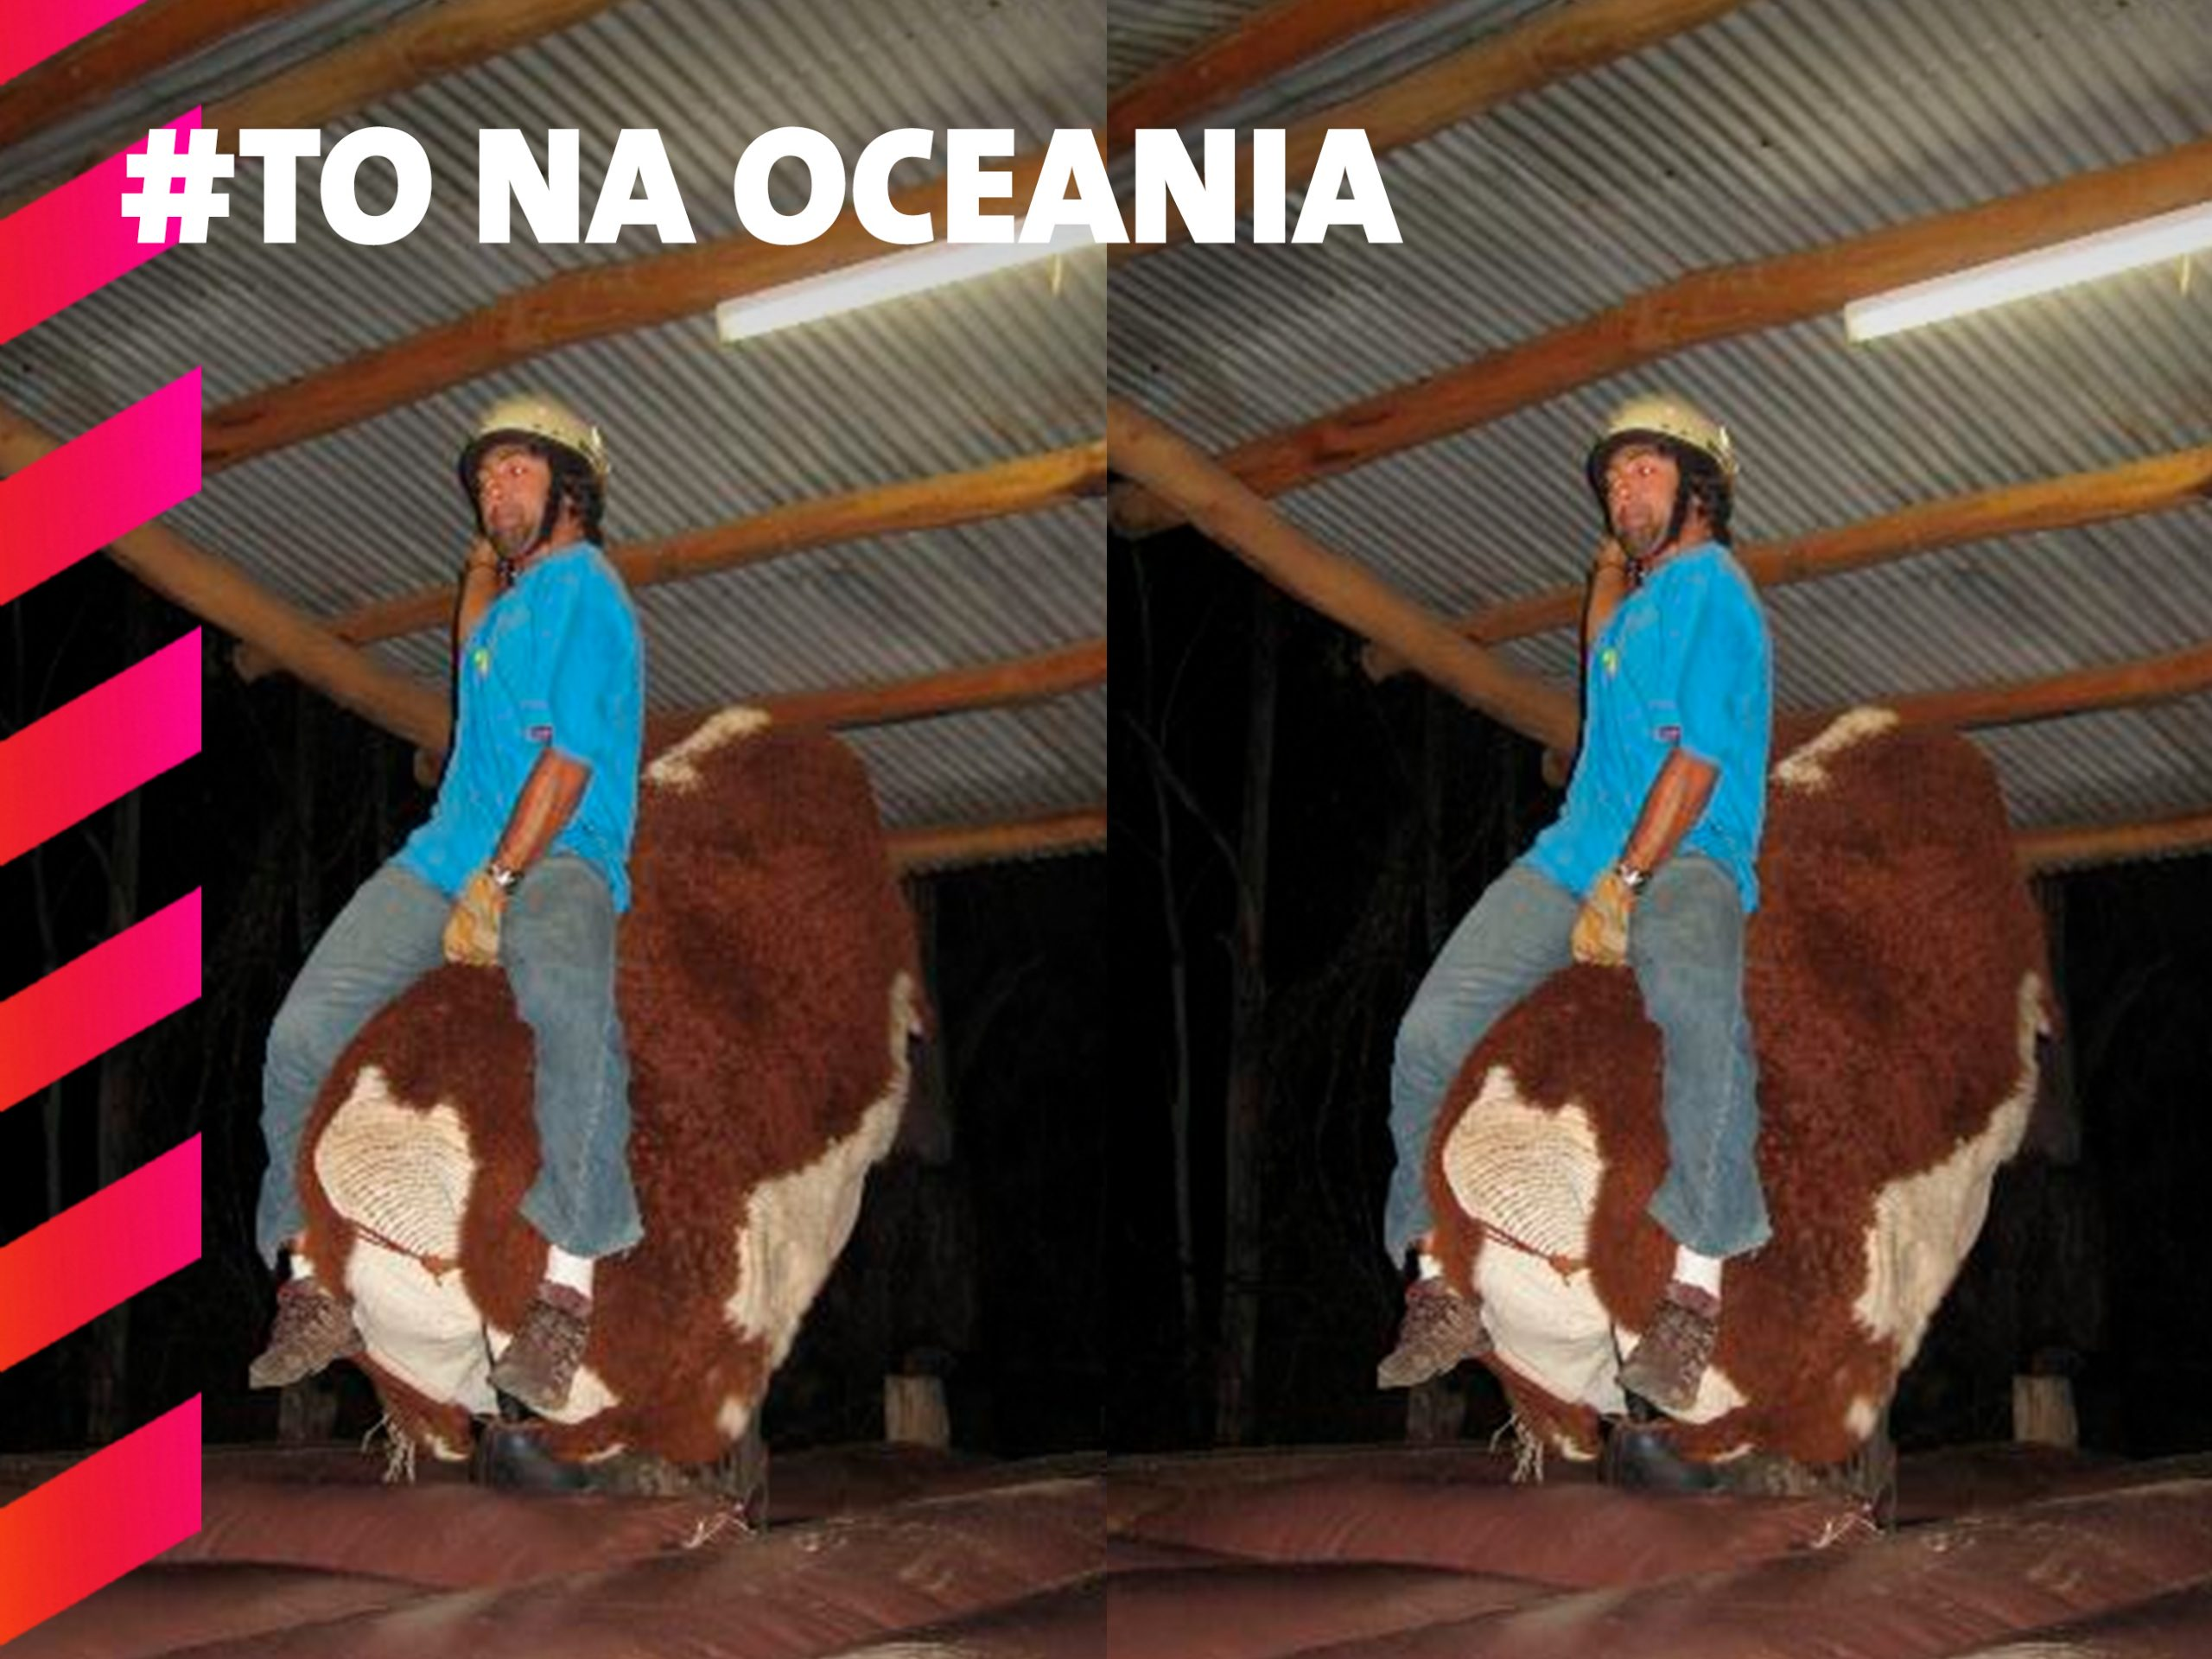 Bull mechanic Riding - Queensland